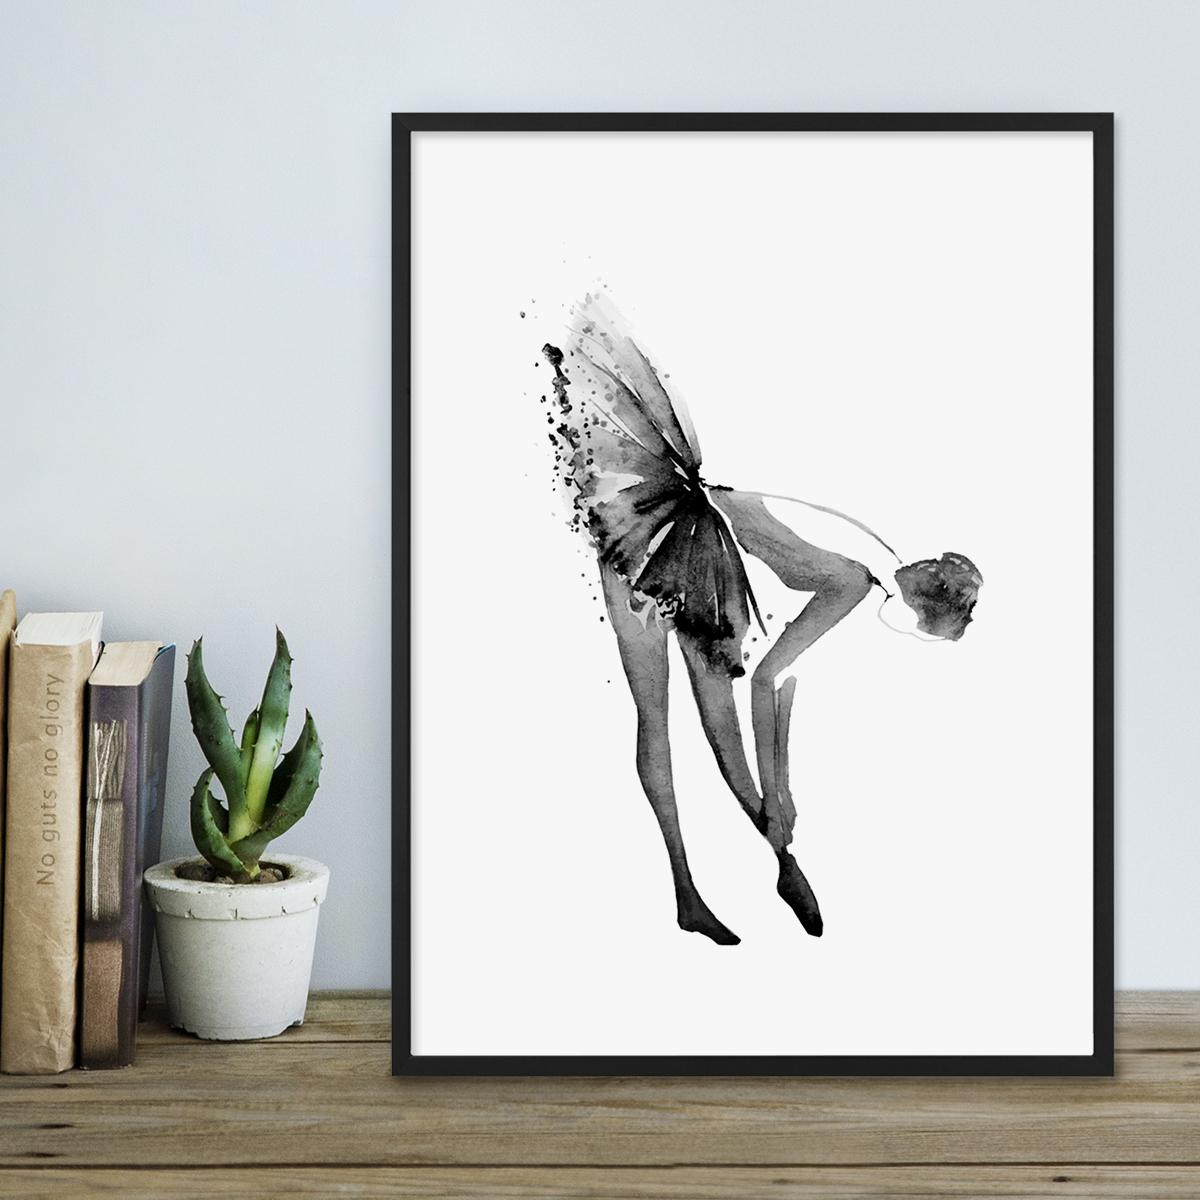 design poster 39 ballerina 39 30x40 cm schwarz weiss motiv ballettt nzerin aquarell poster design motive. Black Bedroom Furniture Sets. Home Design Ideas